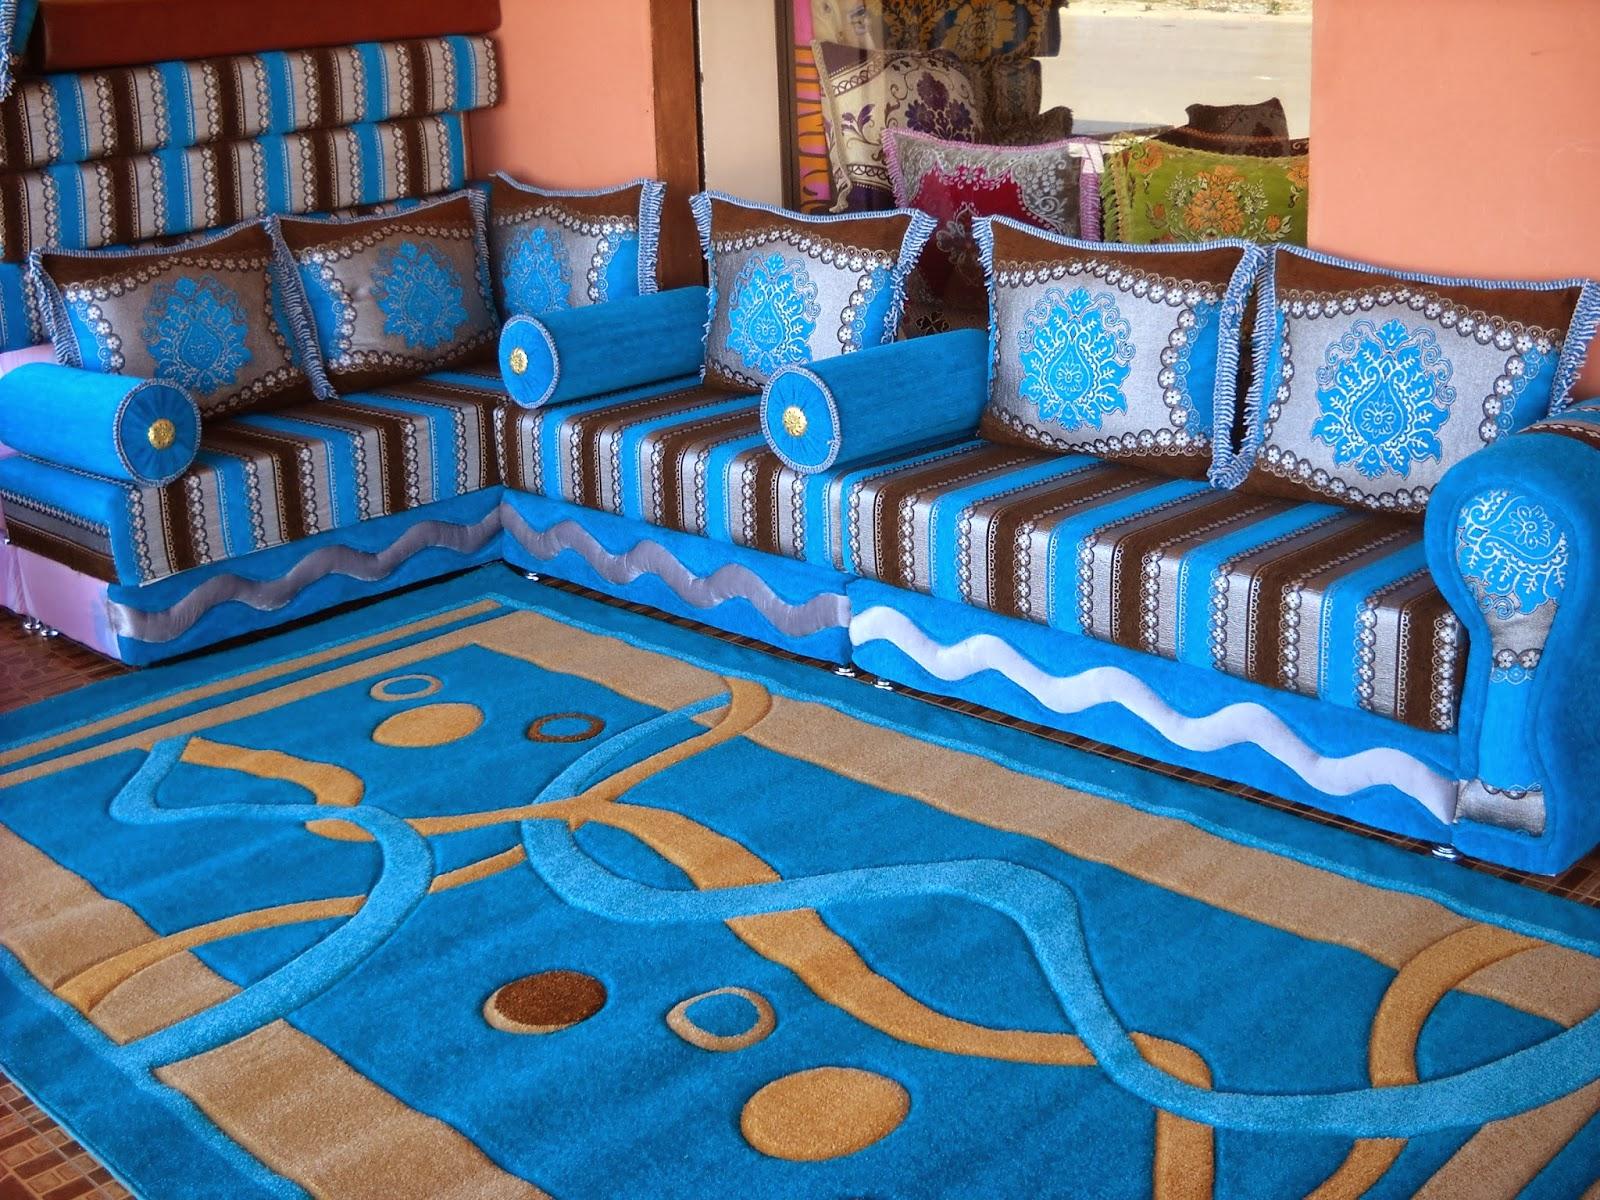 1.bp.blogspot.com/-AuvQUZ89Mdg/Ux9fCVxranI/AAAAAAAAADc/HvLYOU1fx-I/s1600/Salon+Marocain+Moderne.jpg